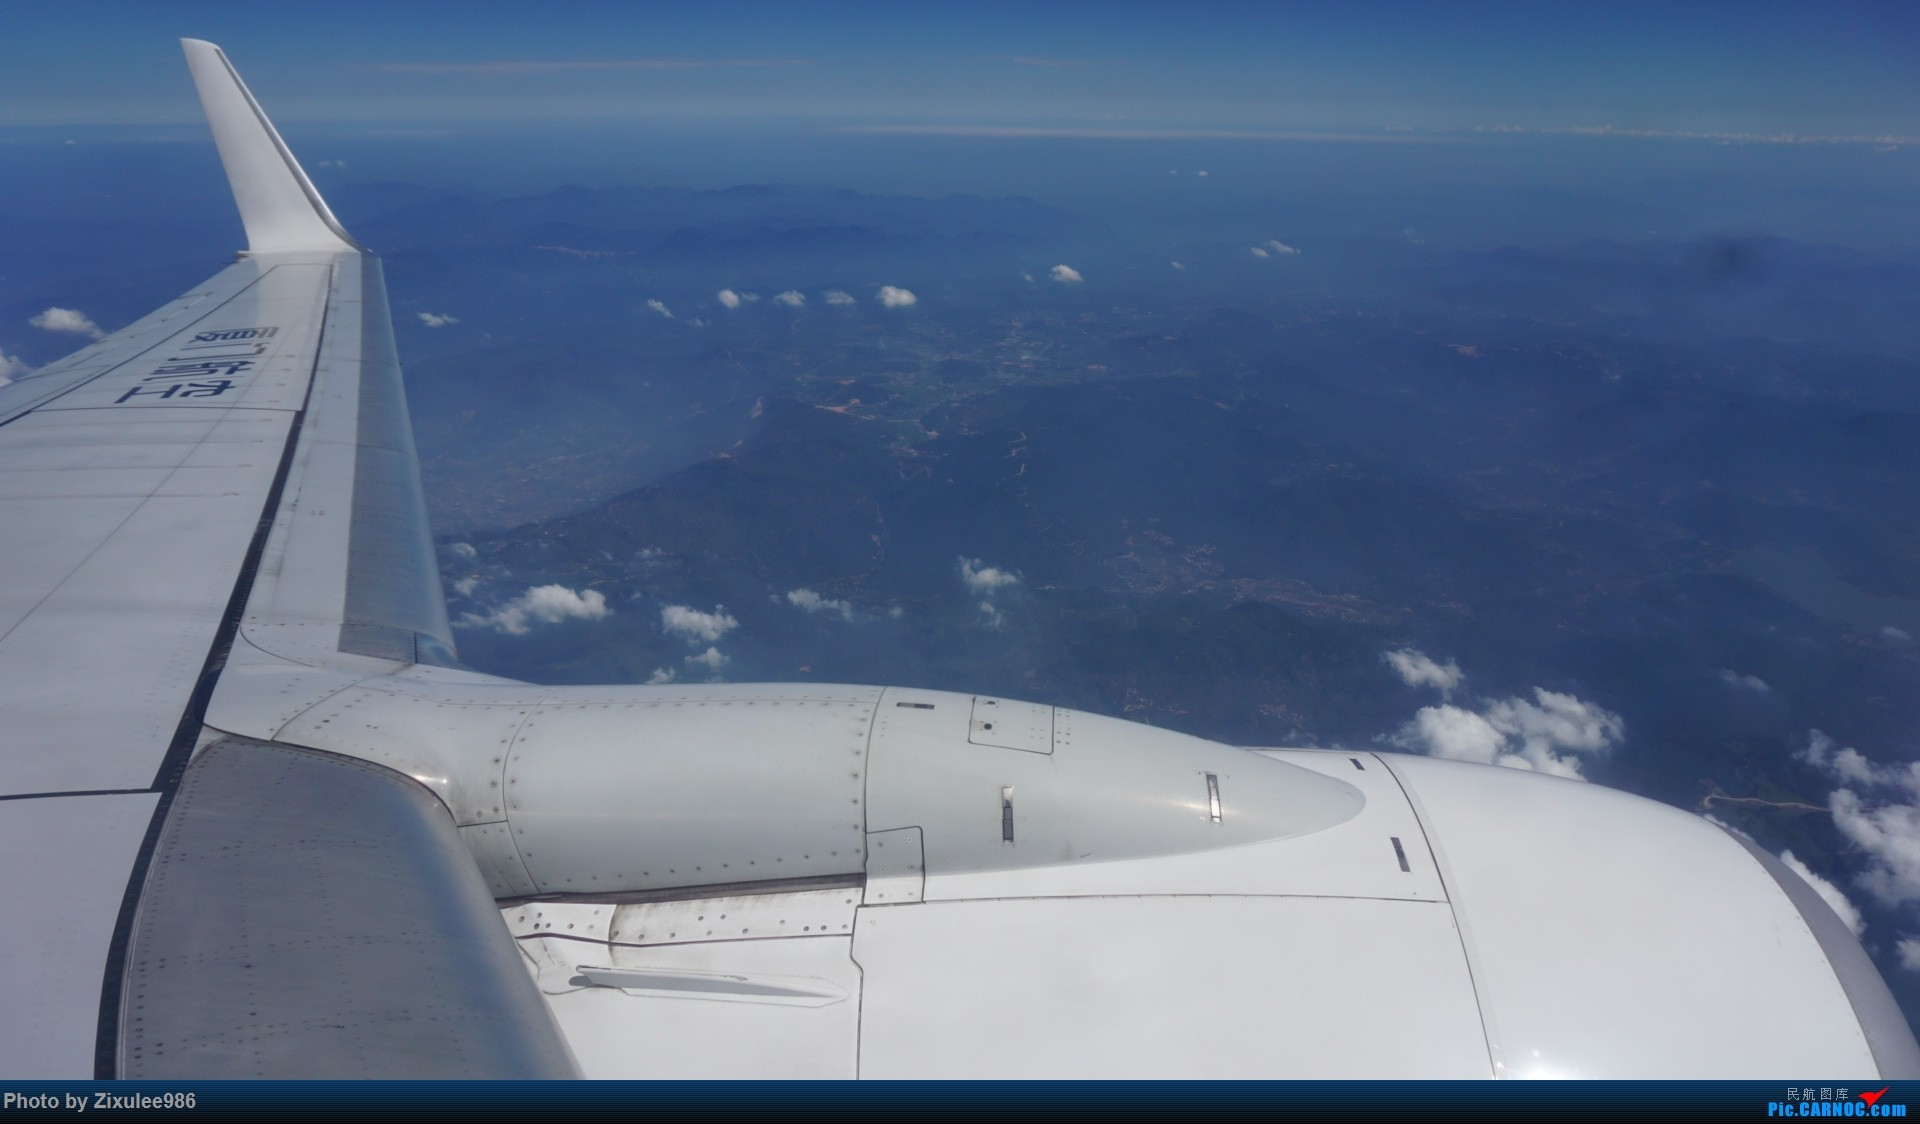 Re:[原创]加拿大21日游学之旅(一)~JJN-PVG-YYZ..(内含flightlog)~第一次发游记~多图缓更请谅解 BOEING 737-800 B-5707 中国泉州晋江国际机场